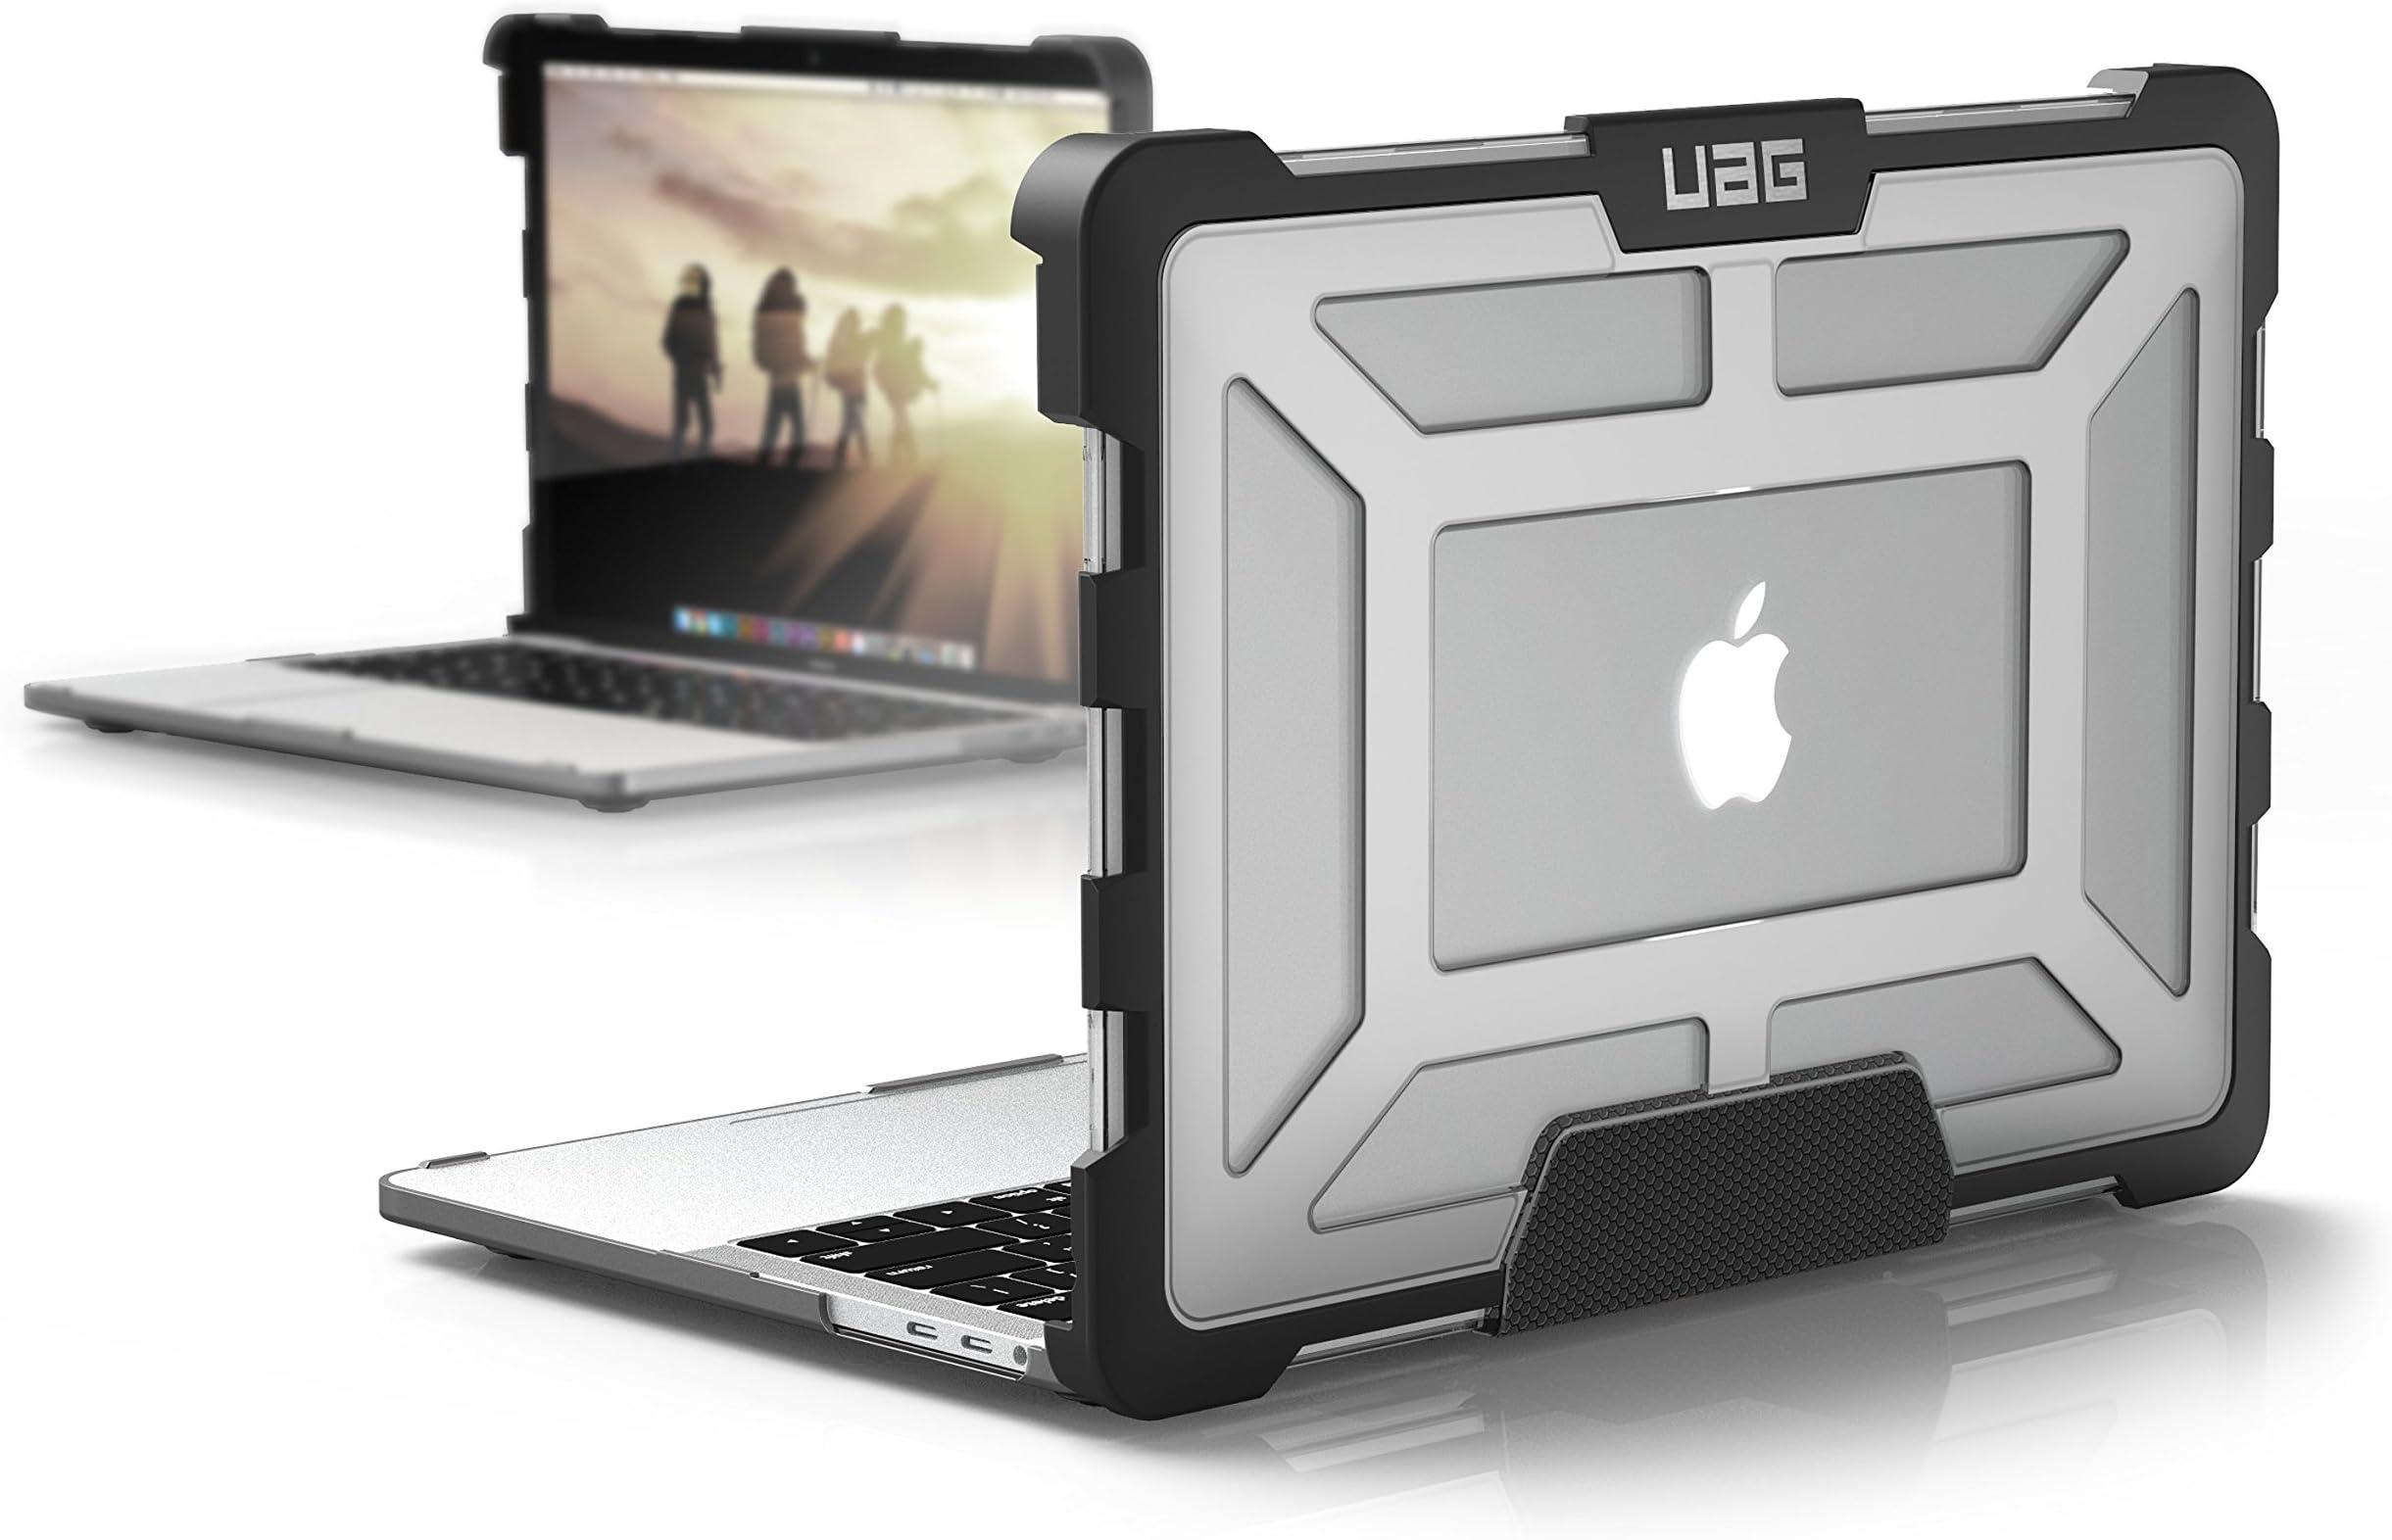 URBAN ARMOR GEAR URBAN ARMOR GEAR MacBook Pro 13-inch (4th Gen, 2016-2019) Feather-Light Rugged Ice Military Drop Tested Laptop Case